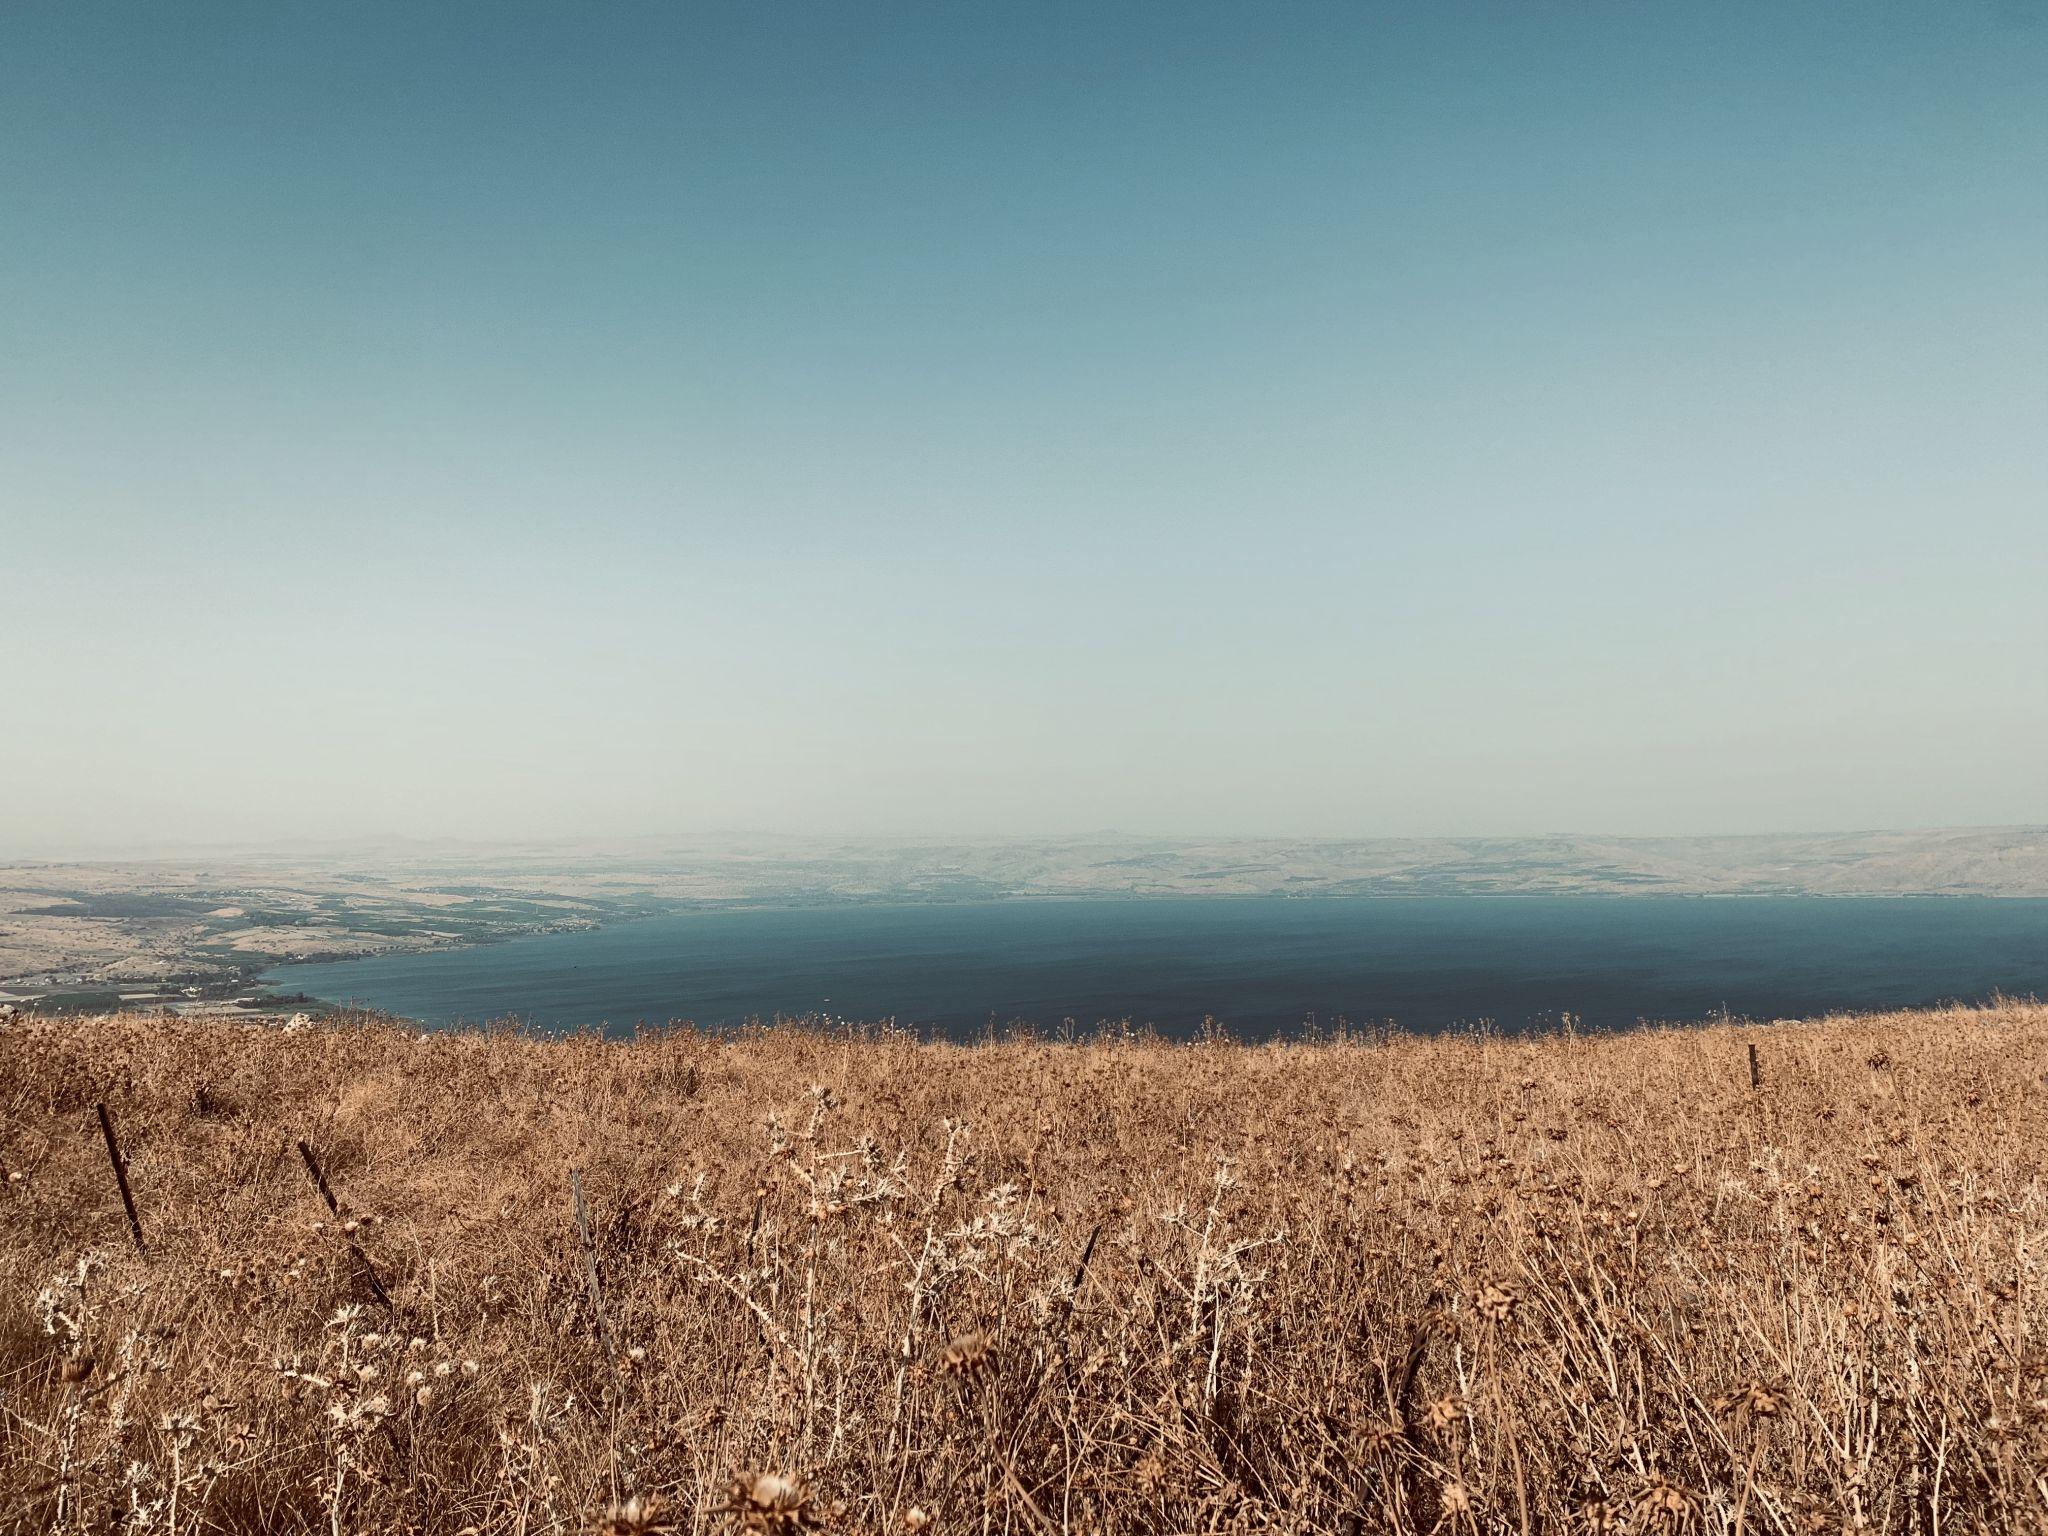 Sea of Galilea, view from Mount Arbel, Israel